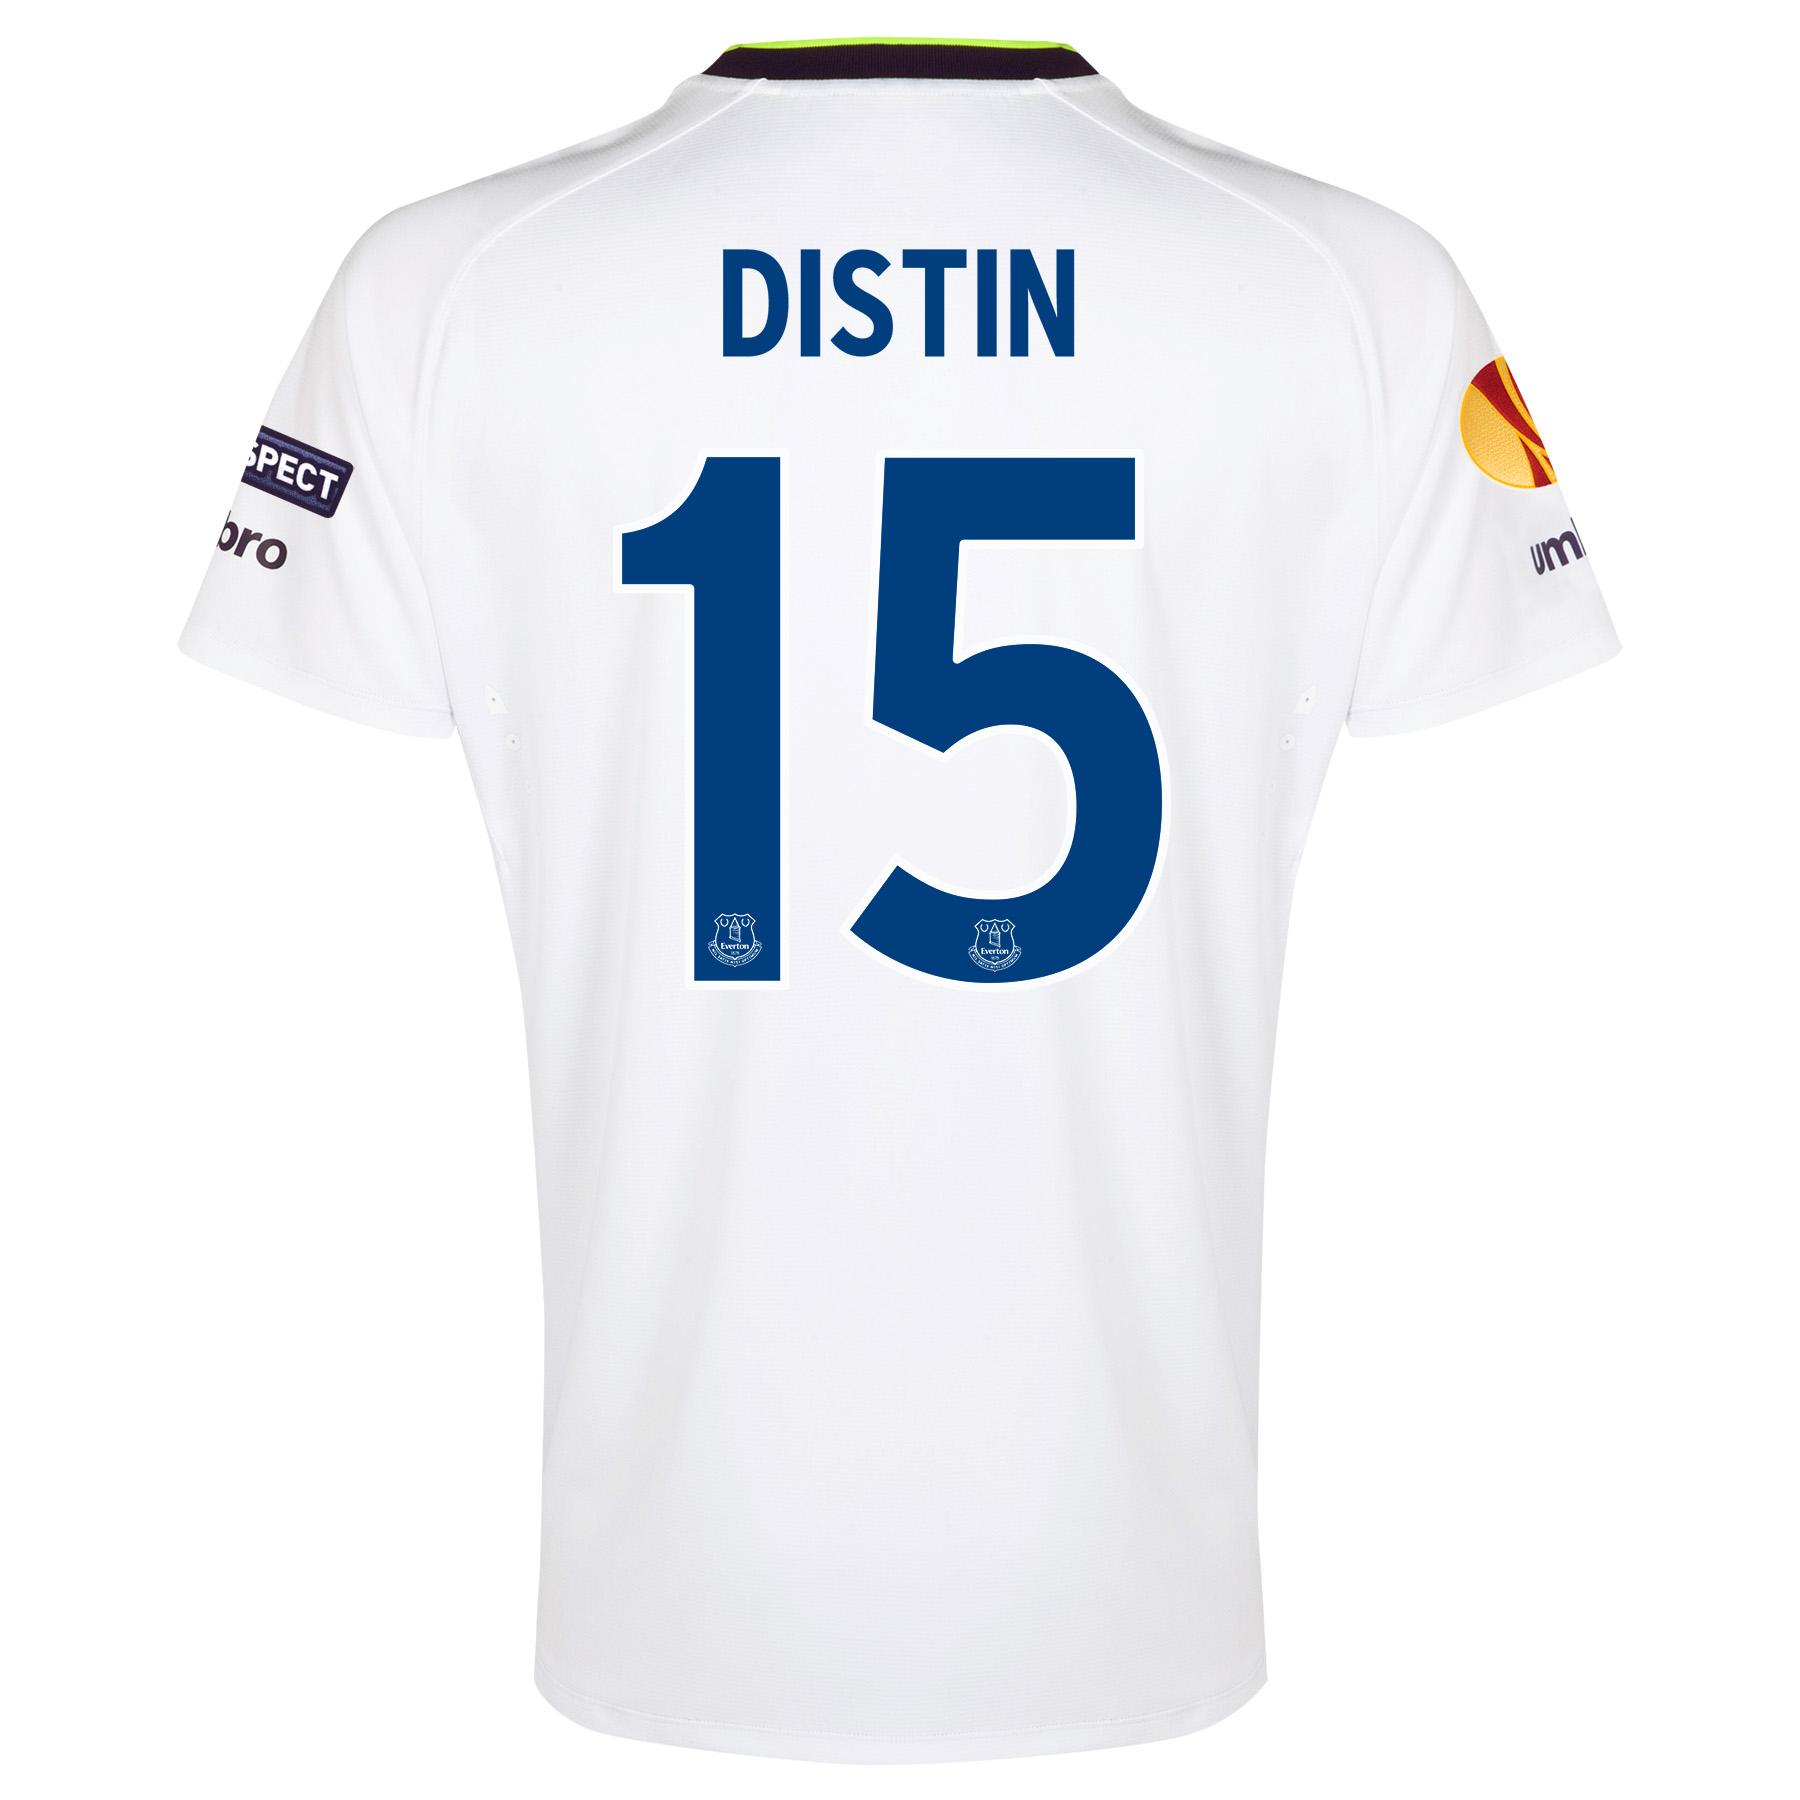 Everton UEFA Europa League 3rd Shirt 2014/15 - Junior with Distin 15 printing